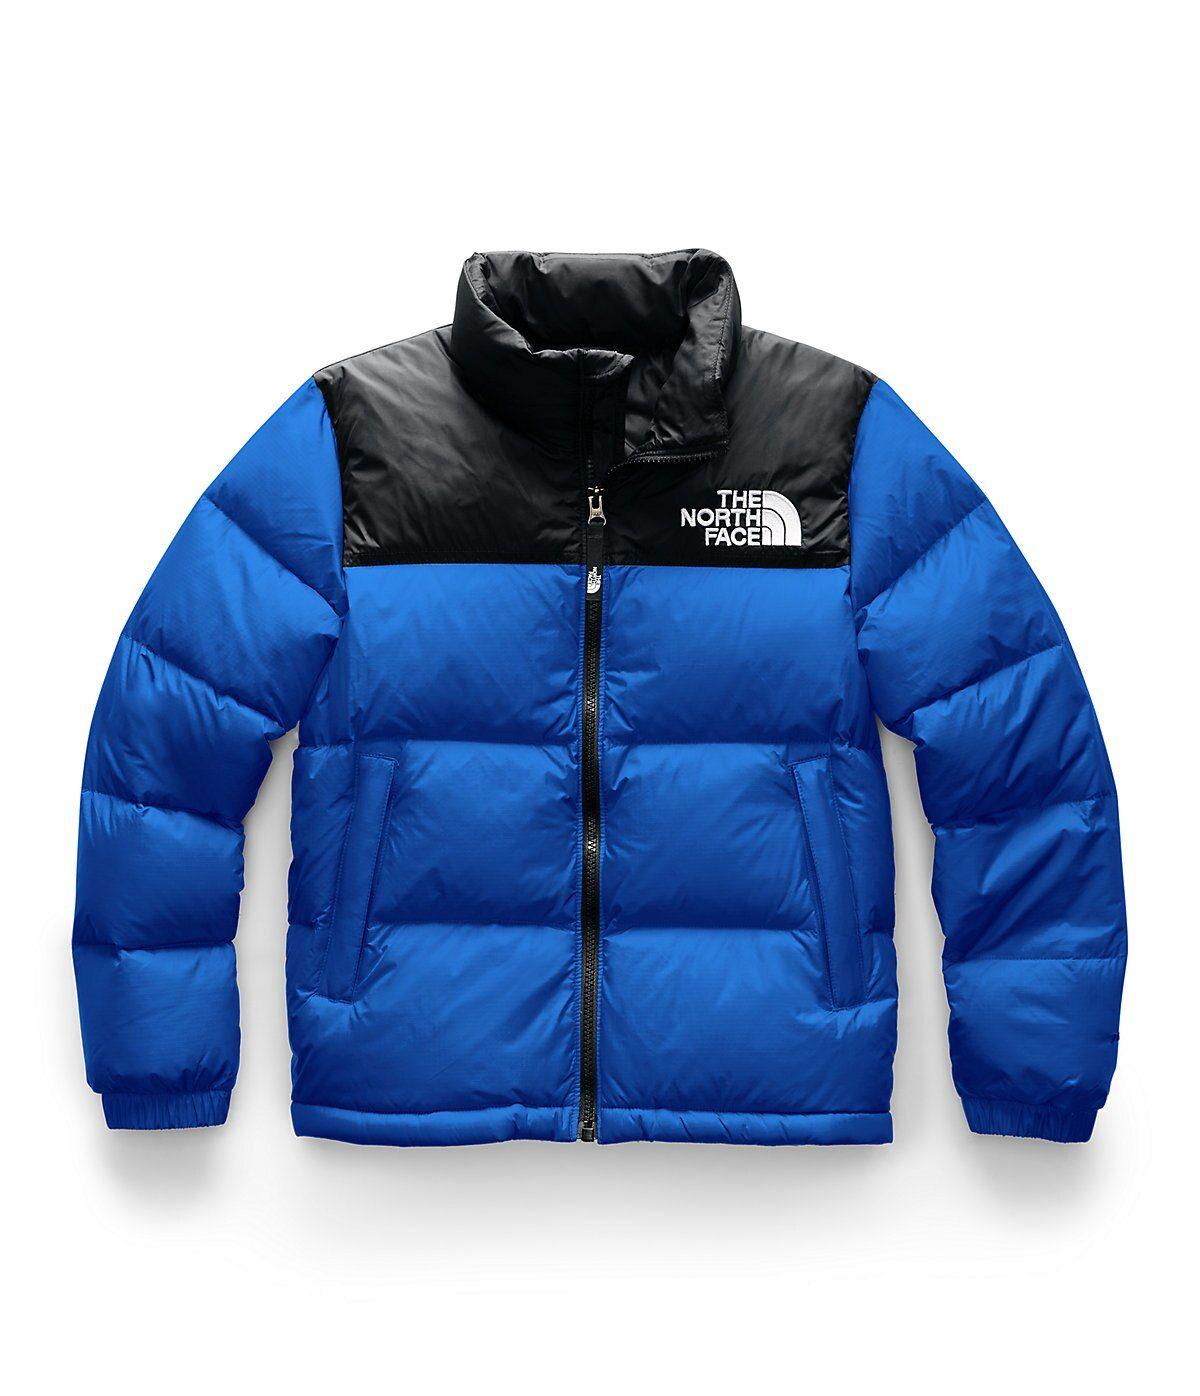 Youth 1996 Retro Nuptse Jacket The North Face In 2021 North Face Bubble Jacket Blue North Face Jacket Retro Nuptse Jacket [ 1396 x 1200 Pixel ]